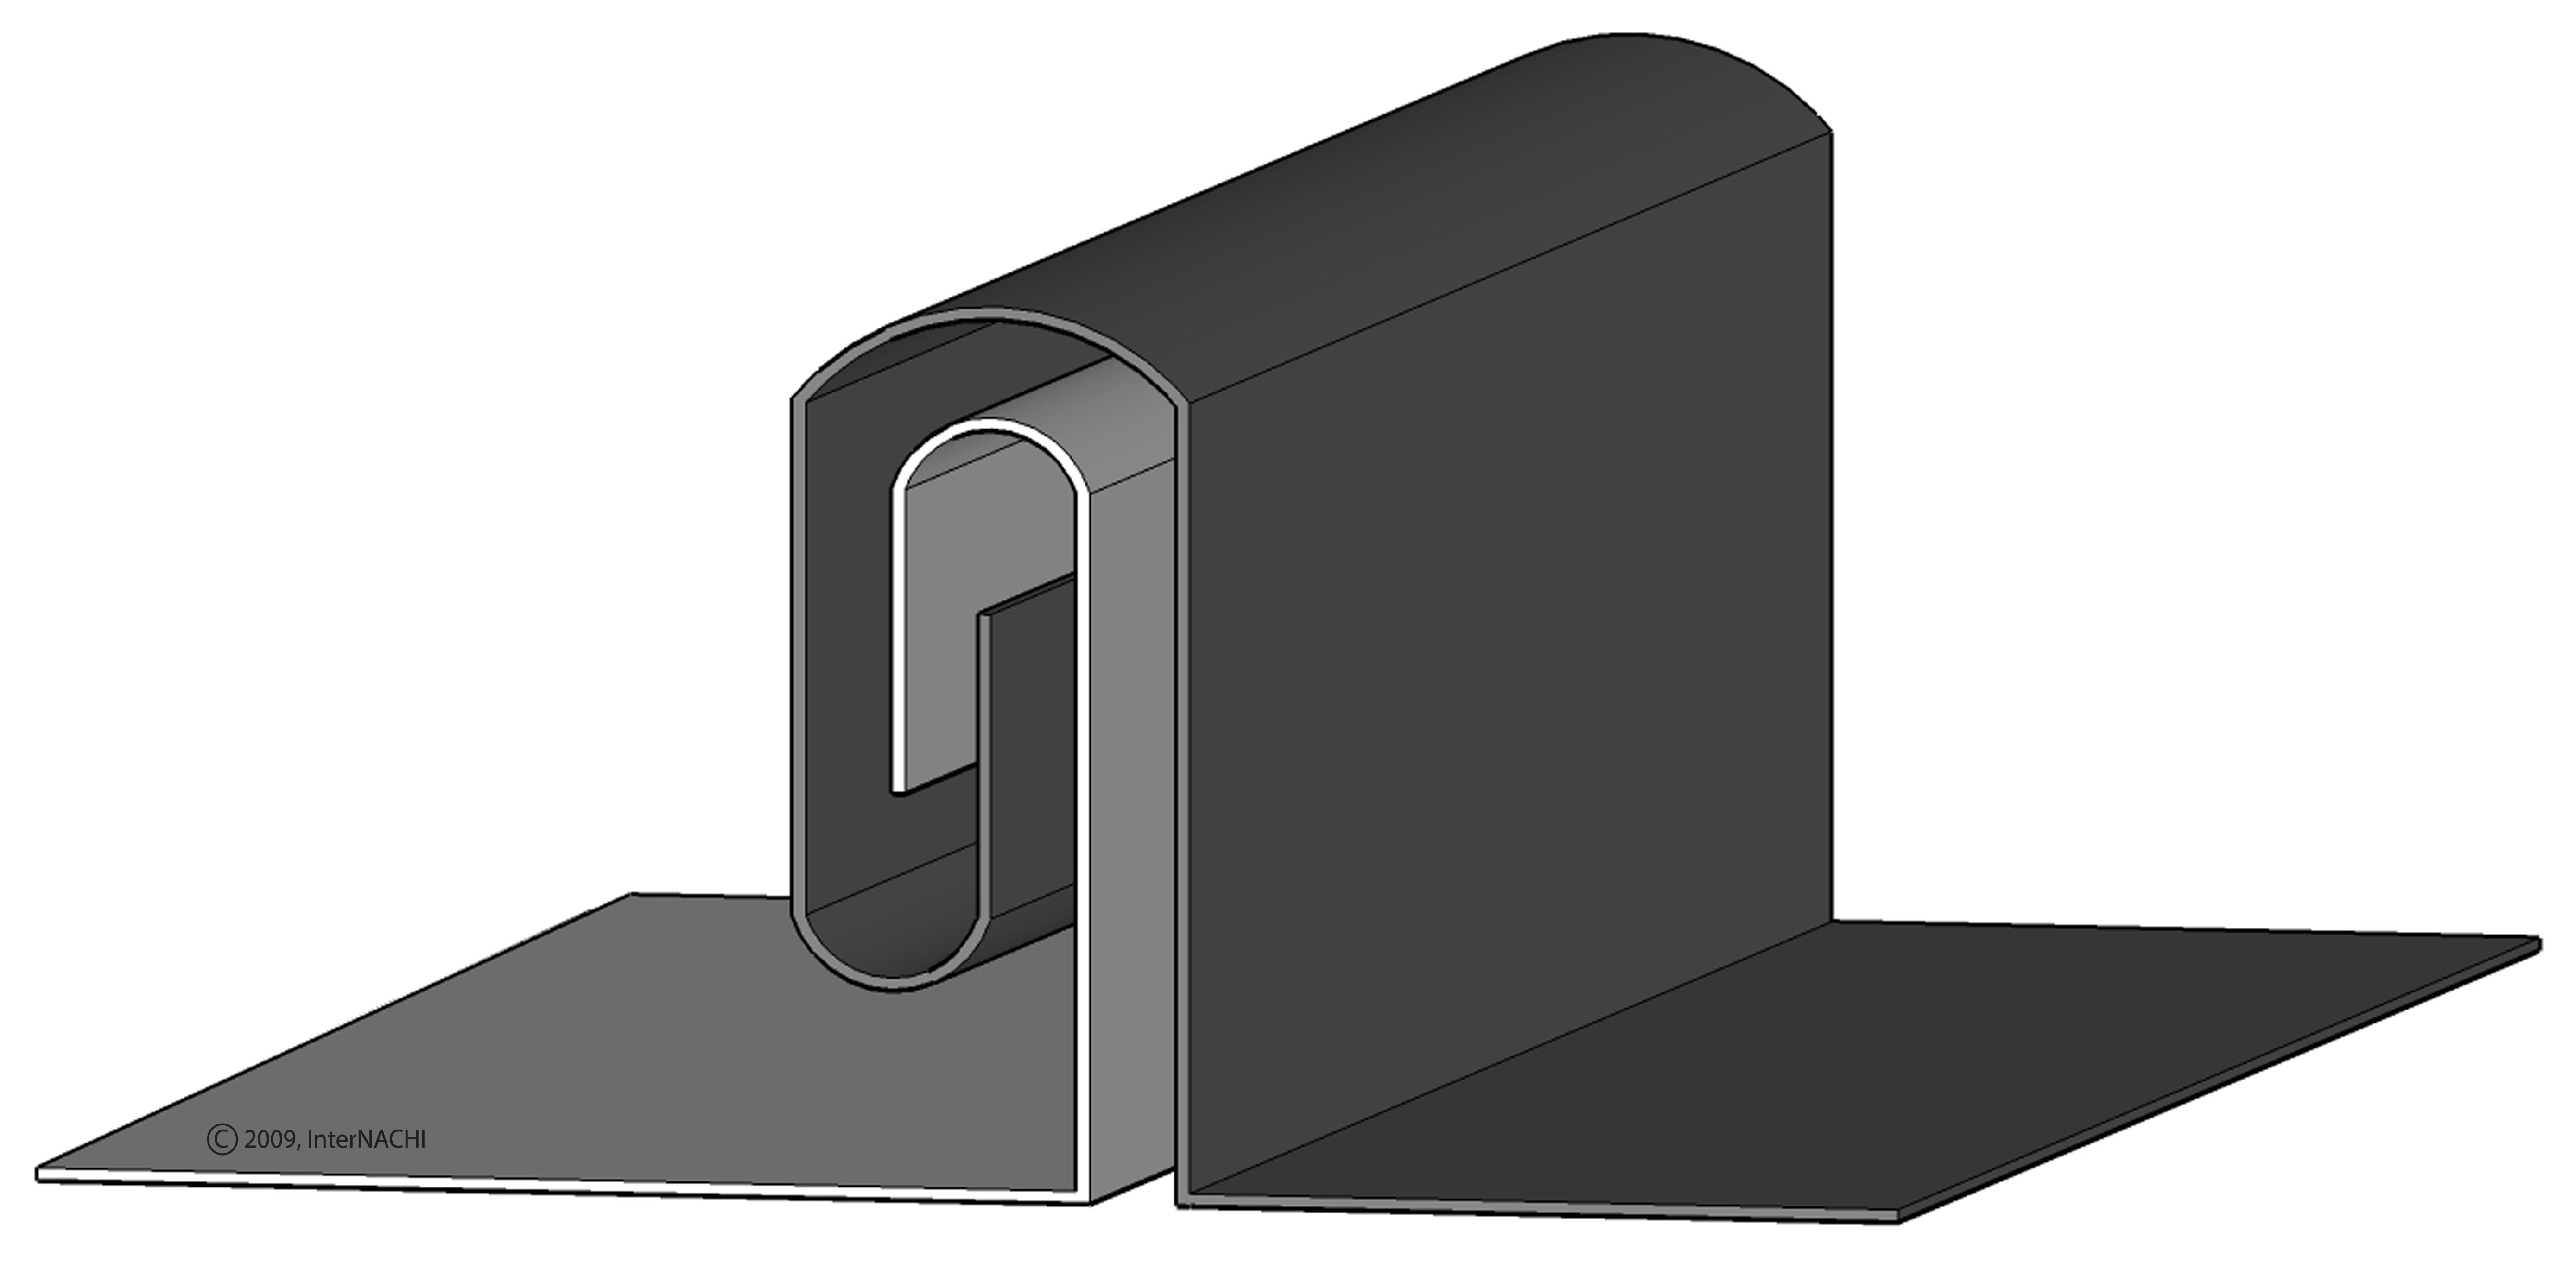 Double Lock Seam Inspection Gallery Internachi 174